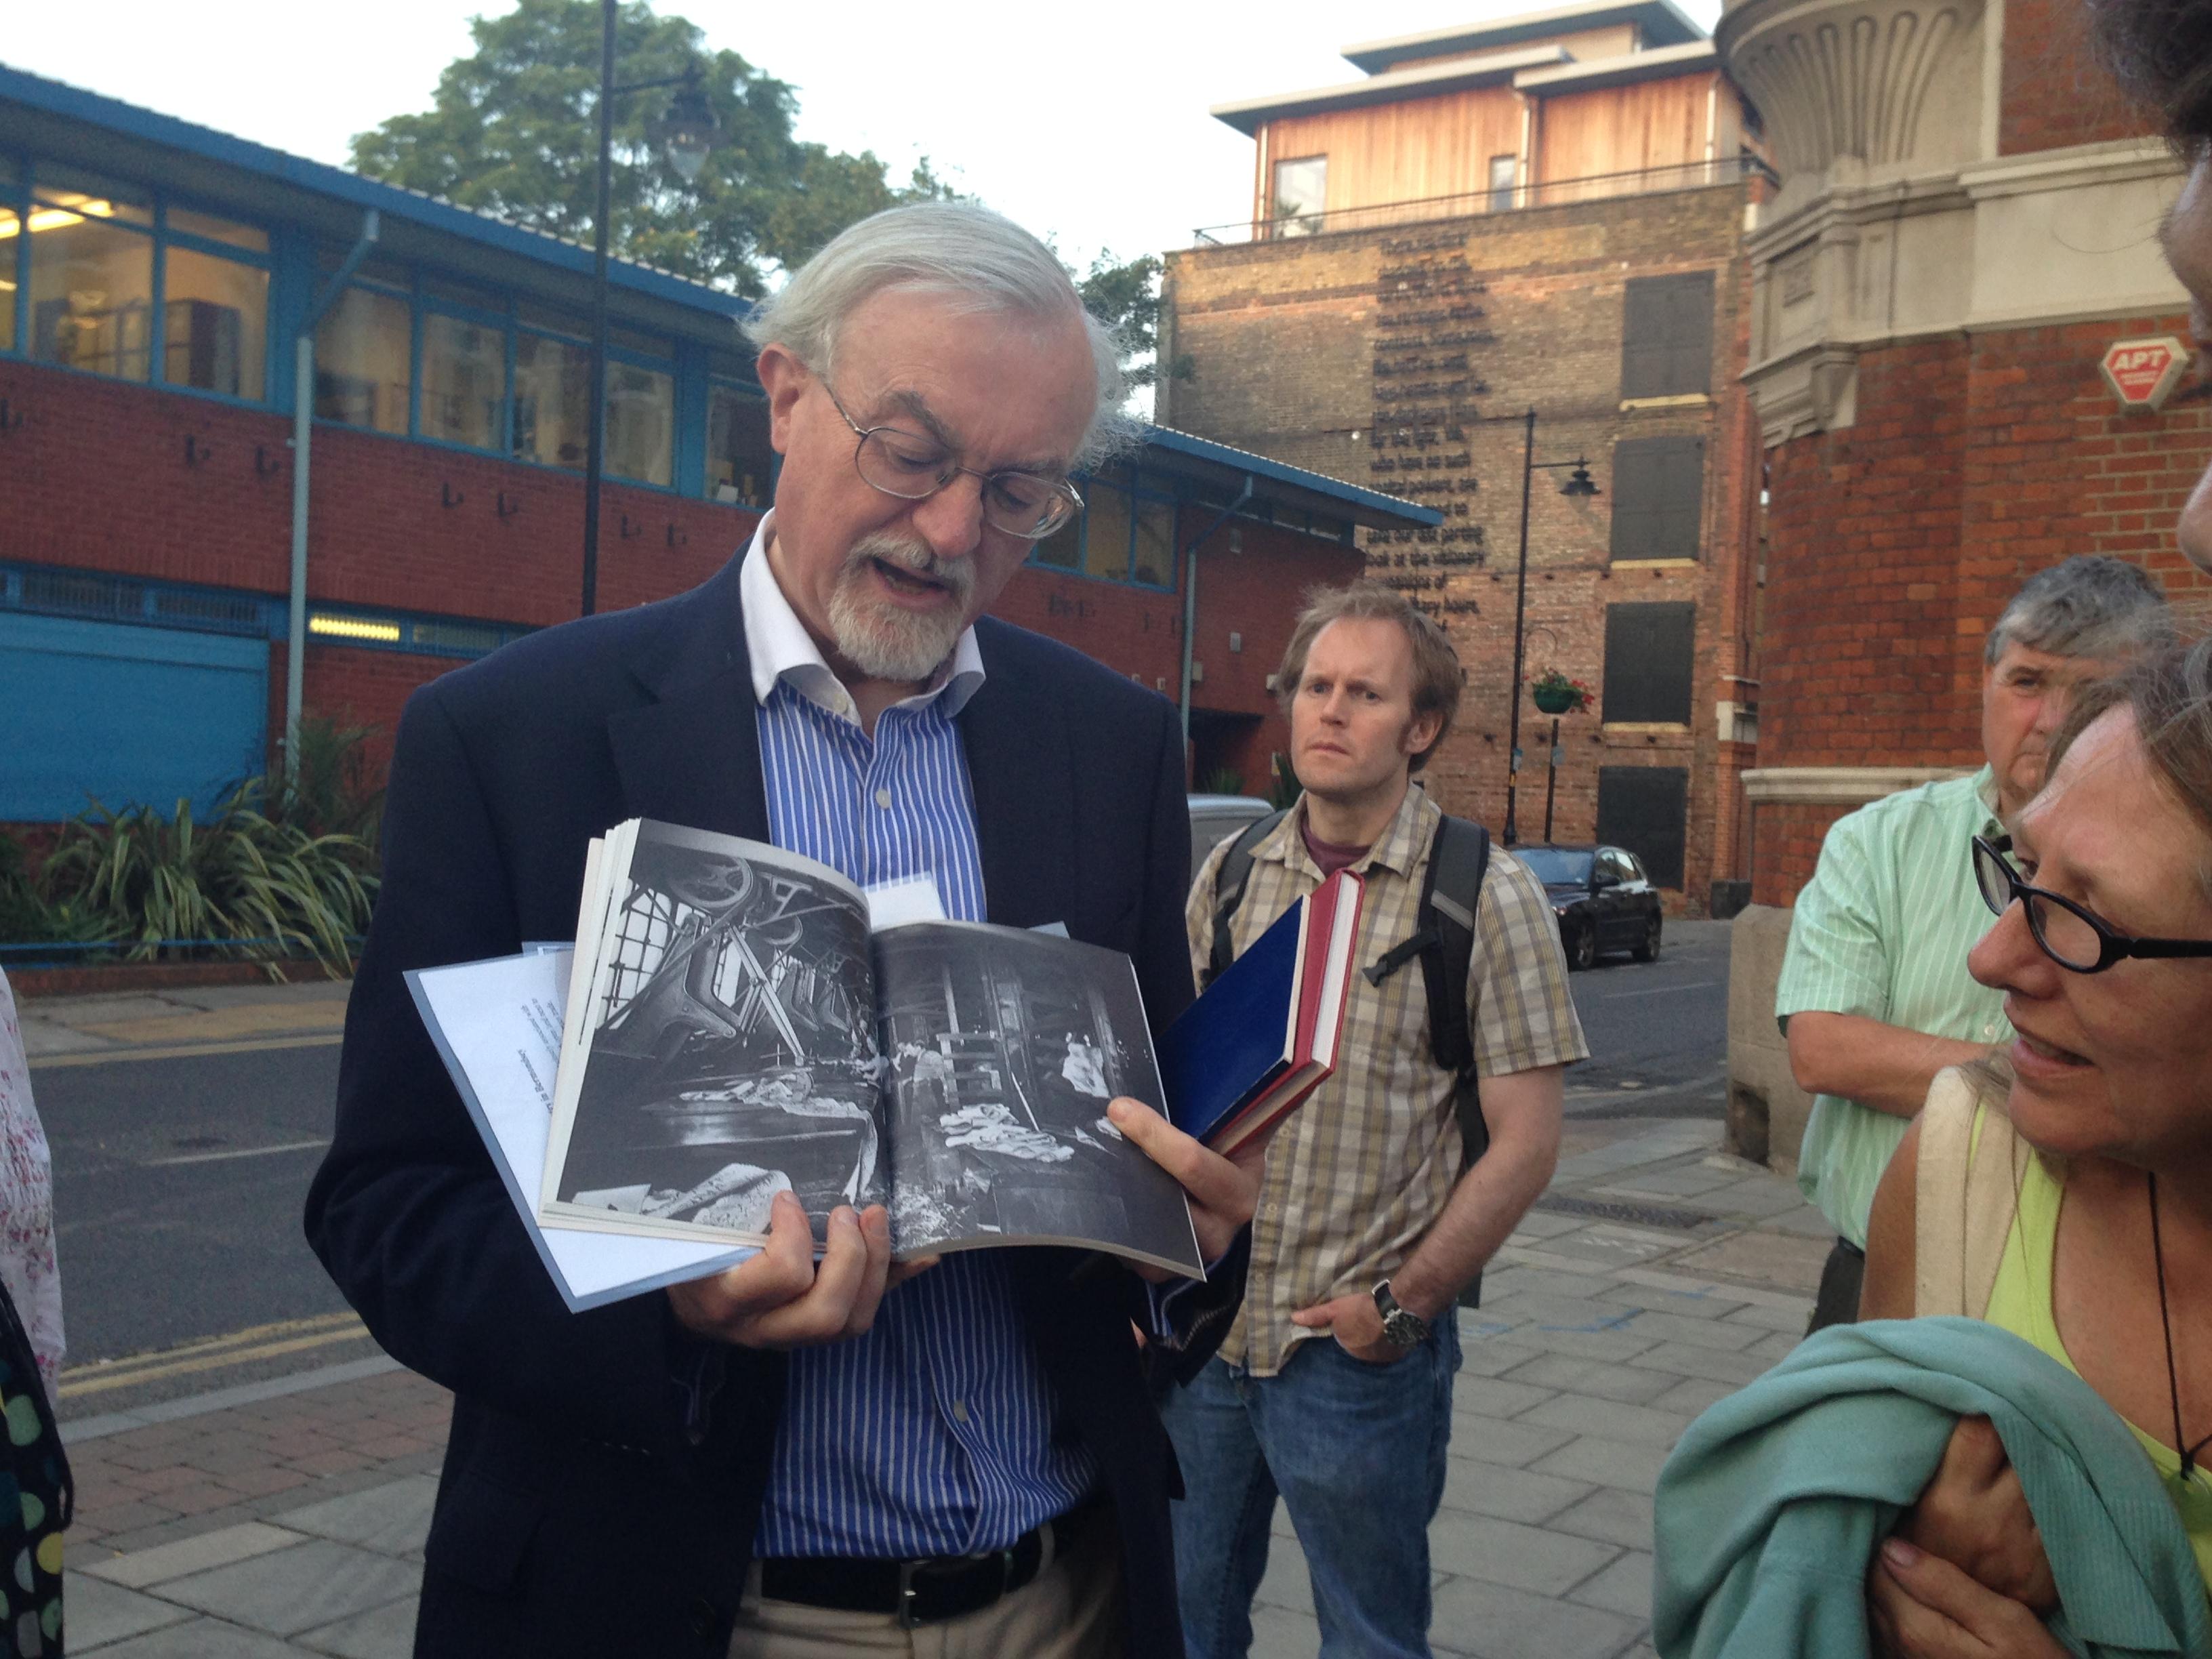 Historian Stephen Humphrey